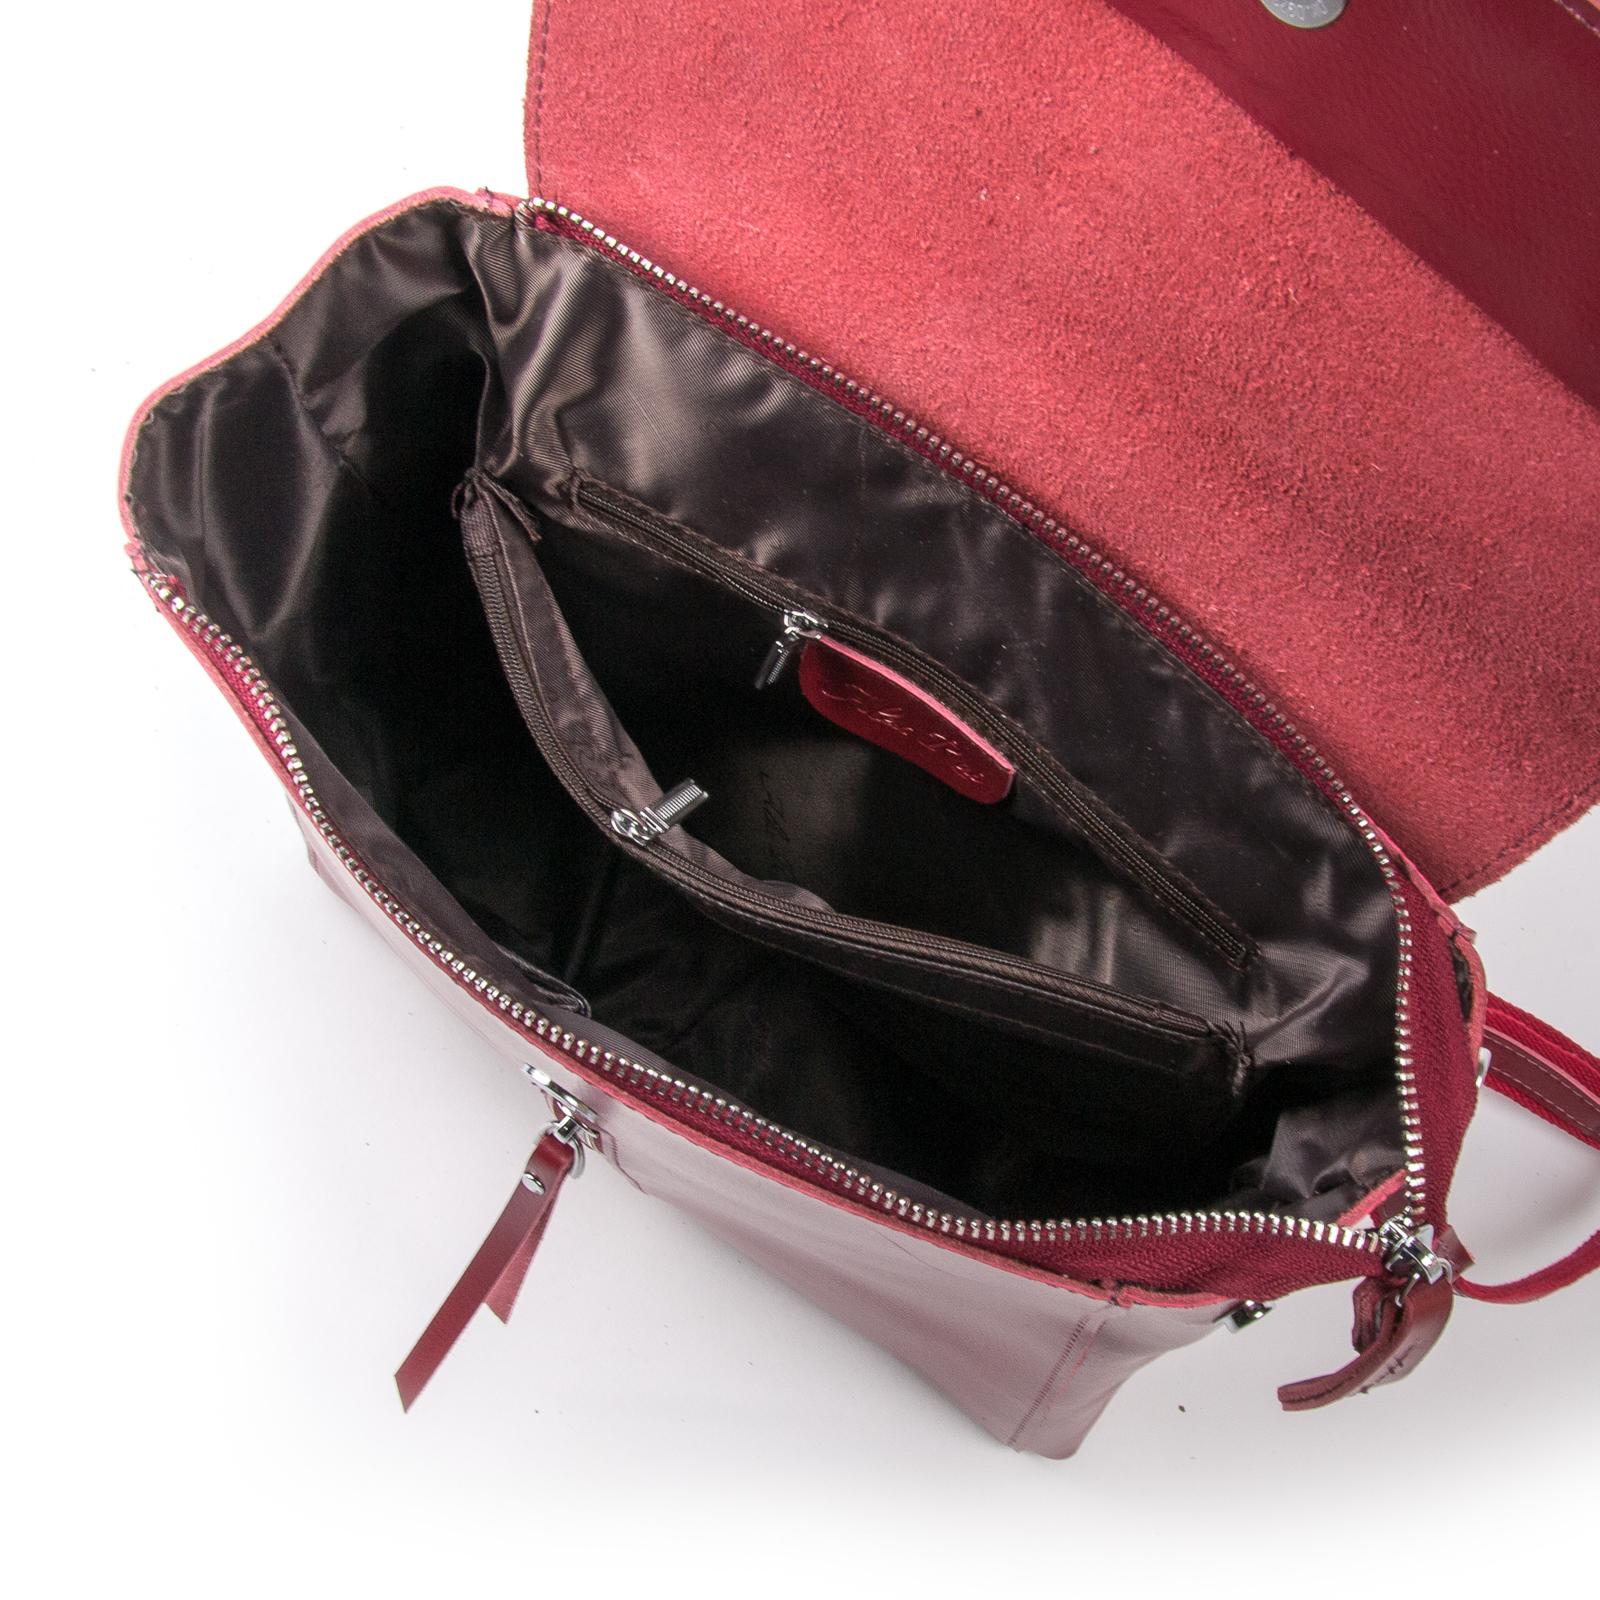 Сумка Женская Рюкзак кожа ALEX RAI 03-01 373 light-red - фото 5